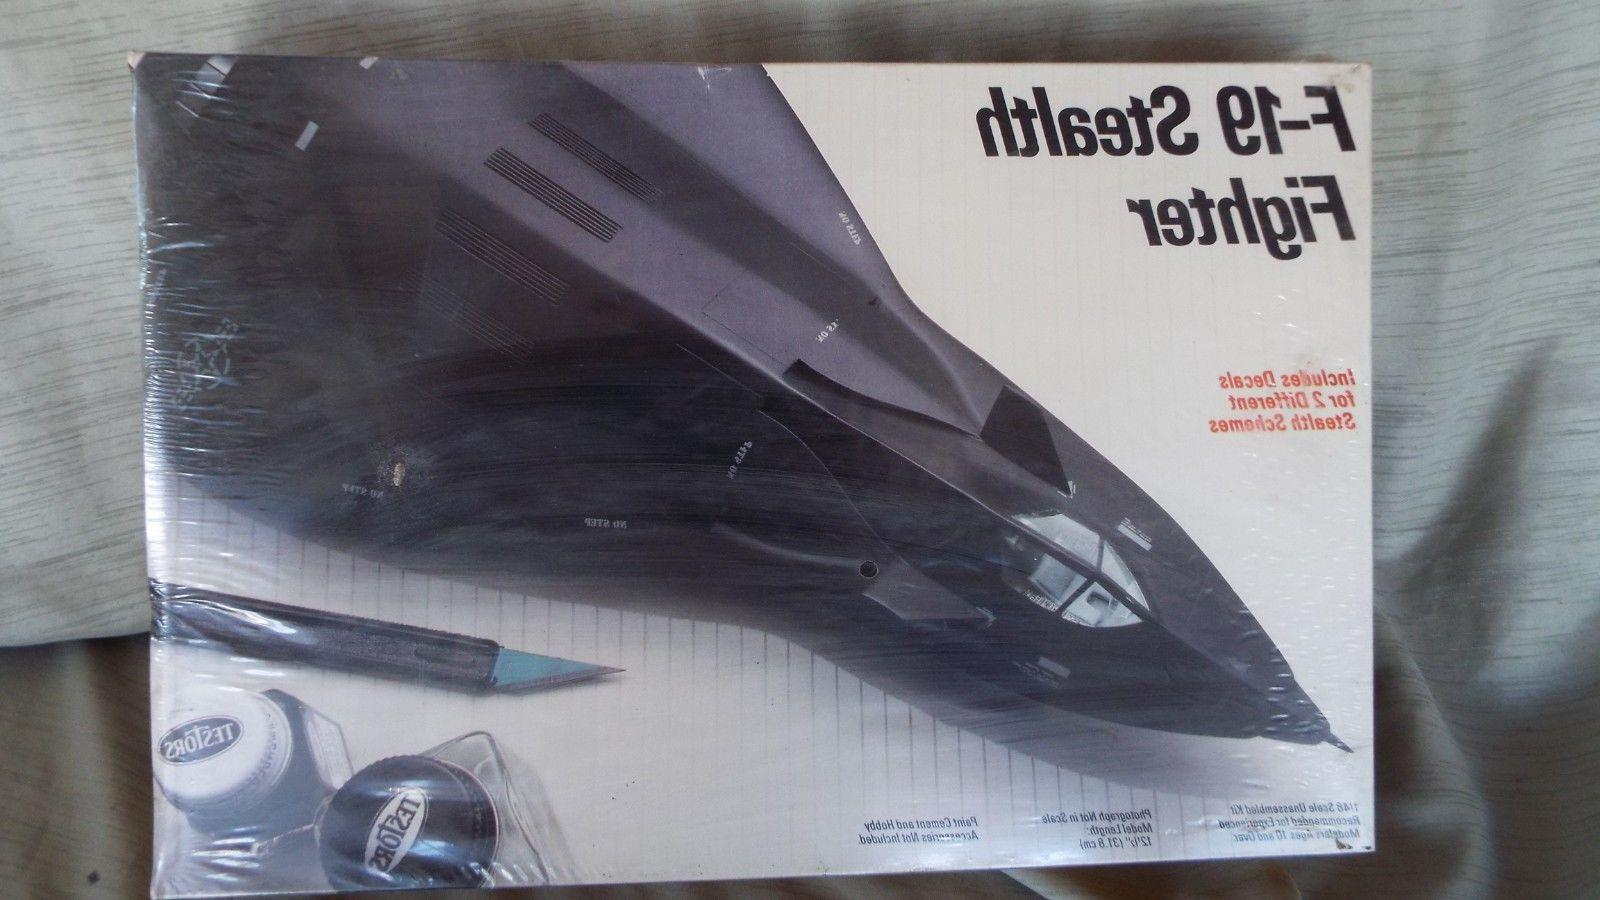 TESTORS F-19 STEALTH FIGHTER - 1/48 SCALE MODEL KIT # 595 -